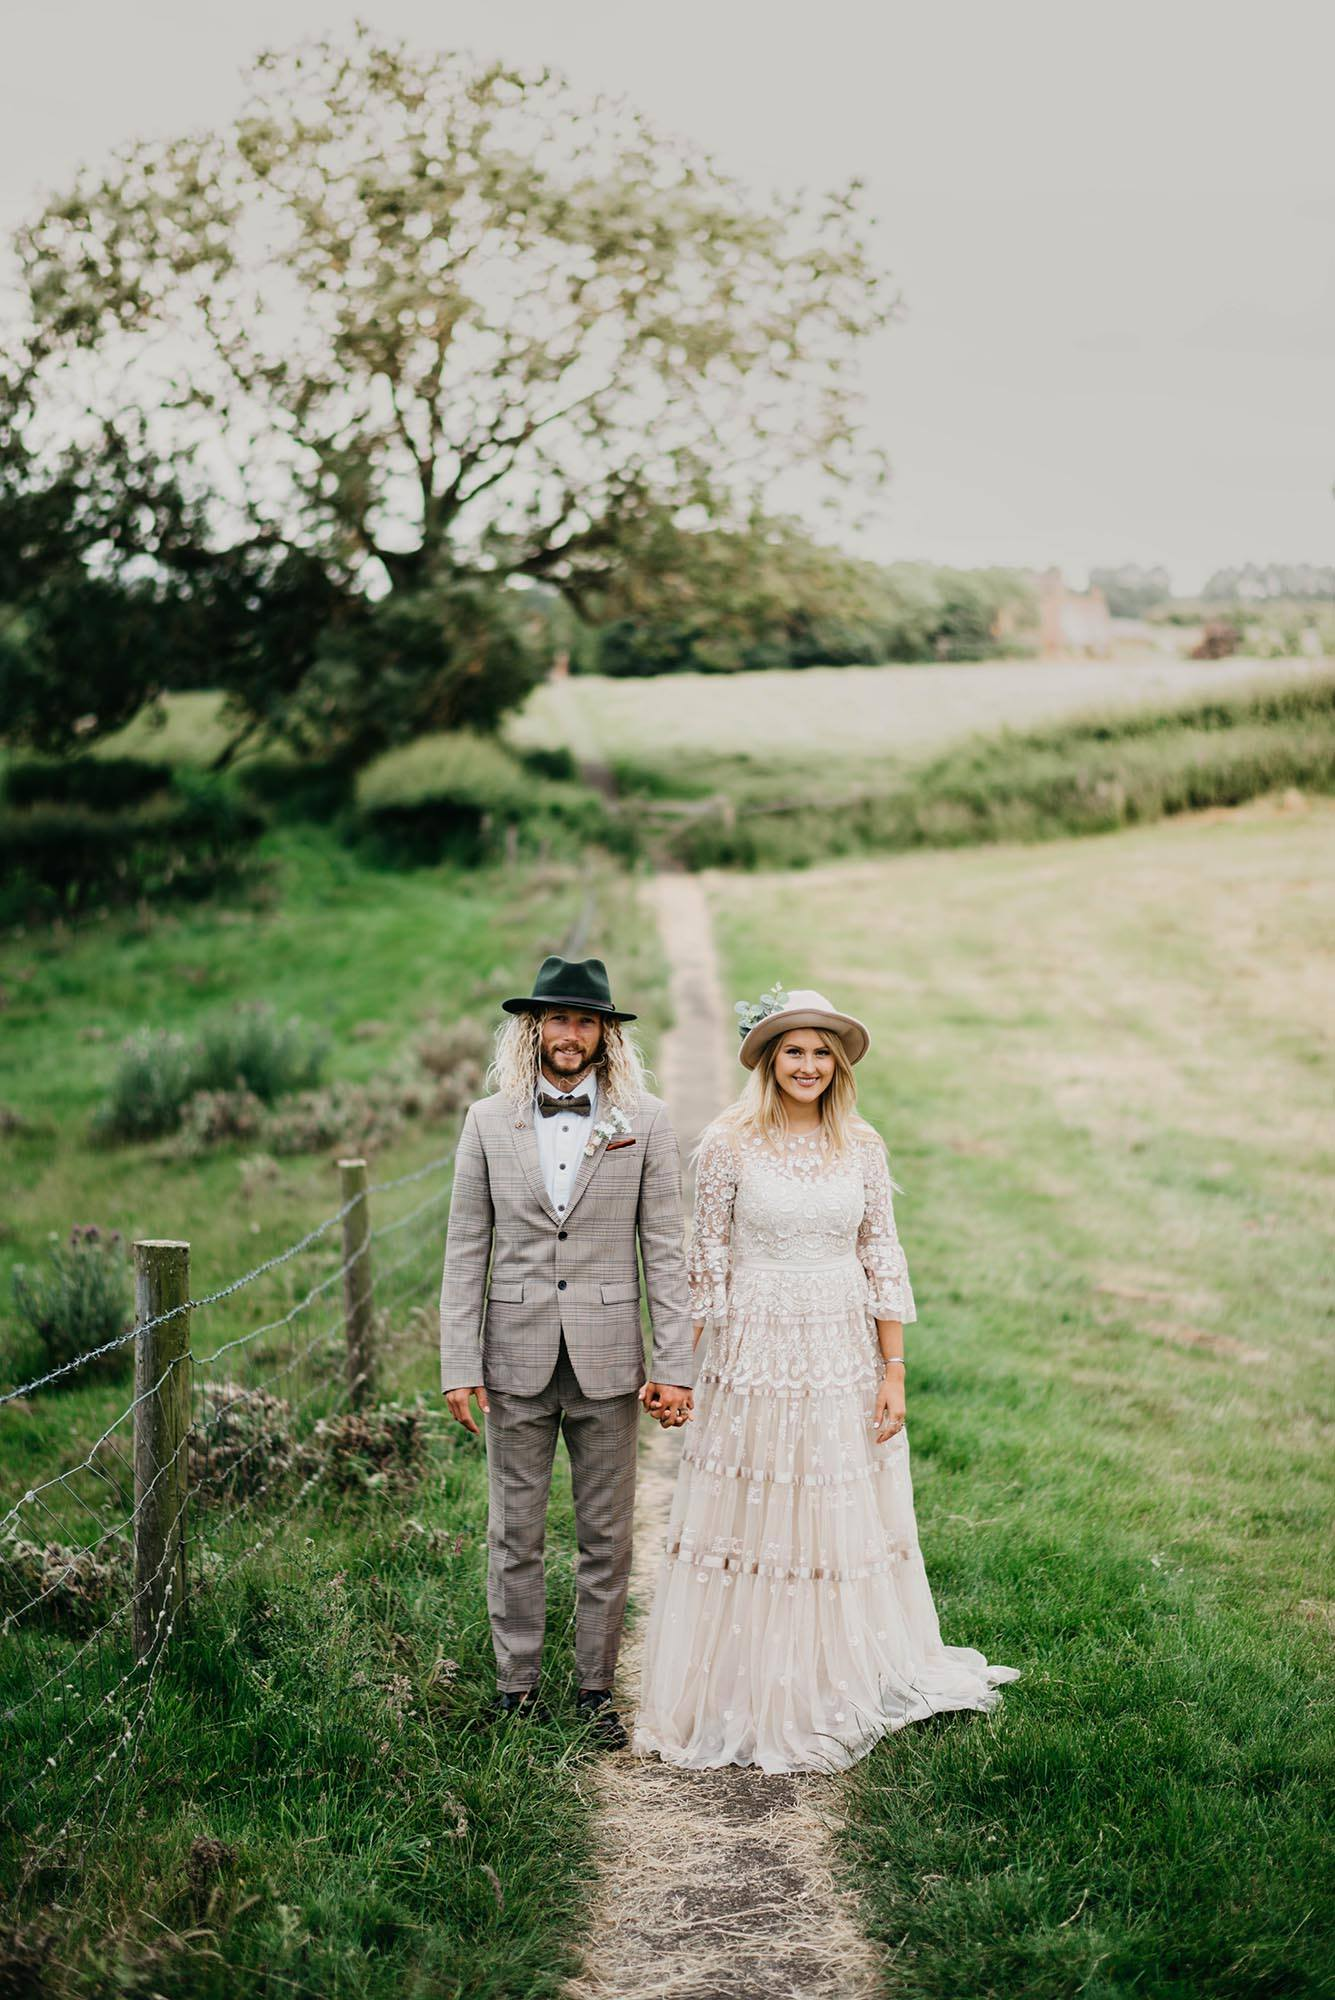 Elopement photographers UK